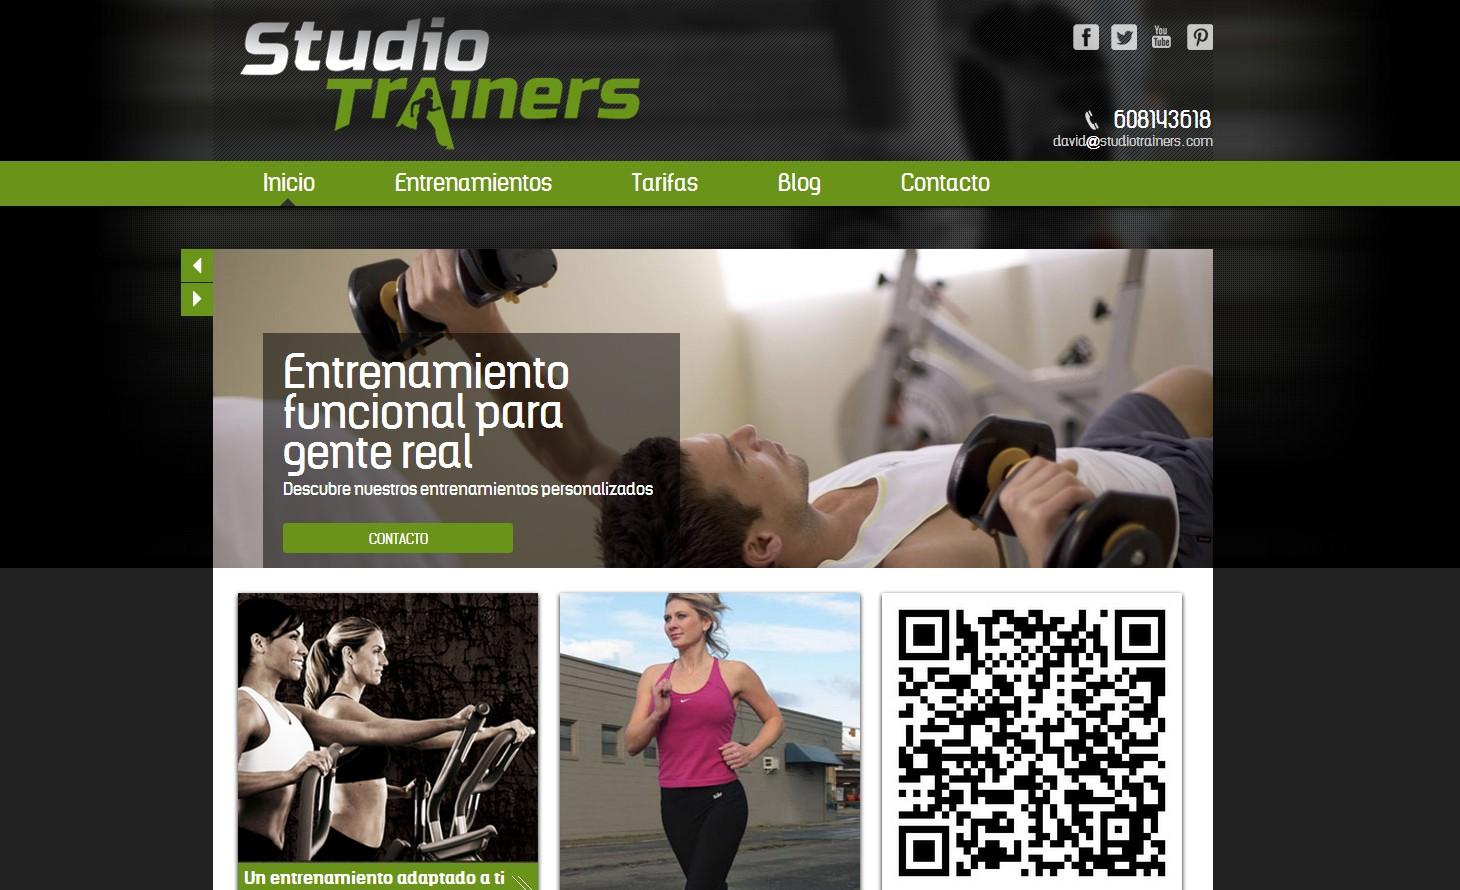 Studio Trainers